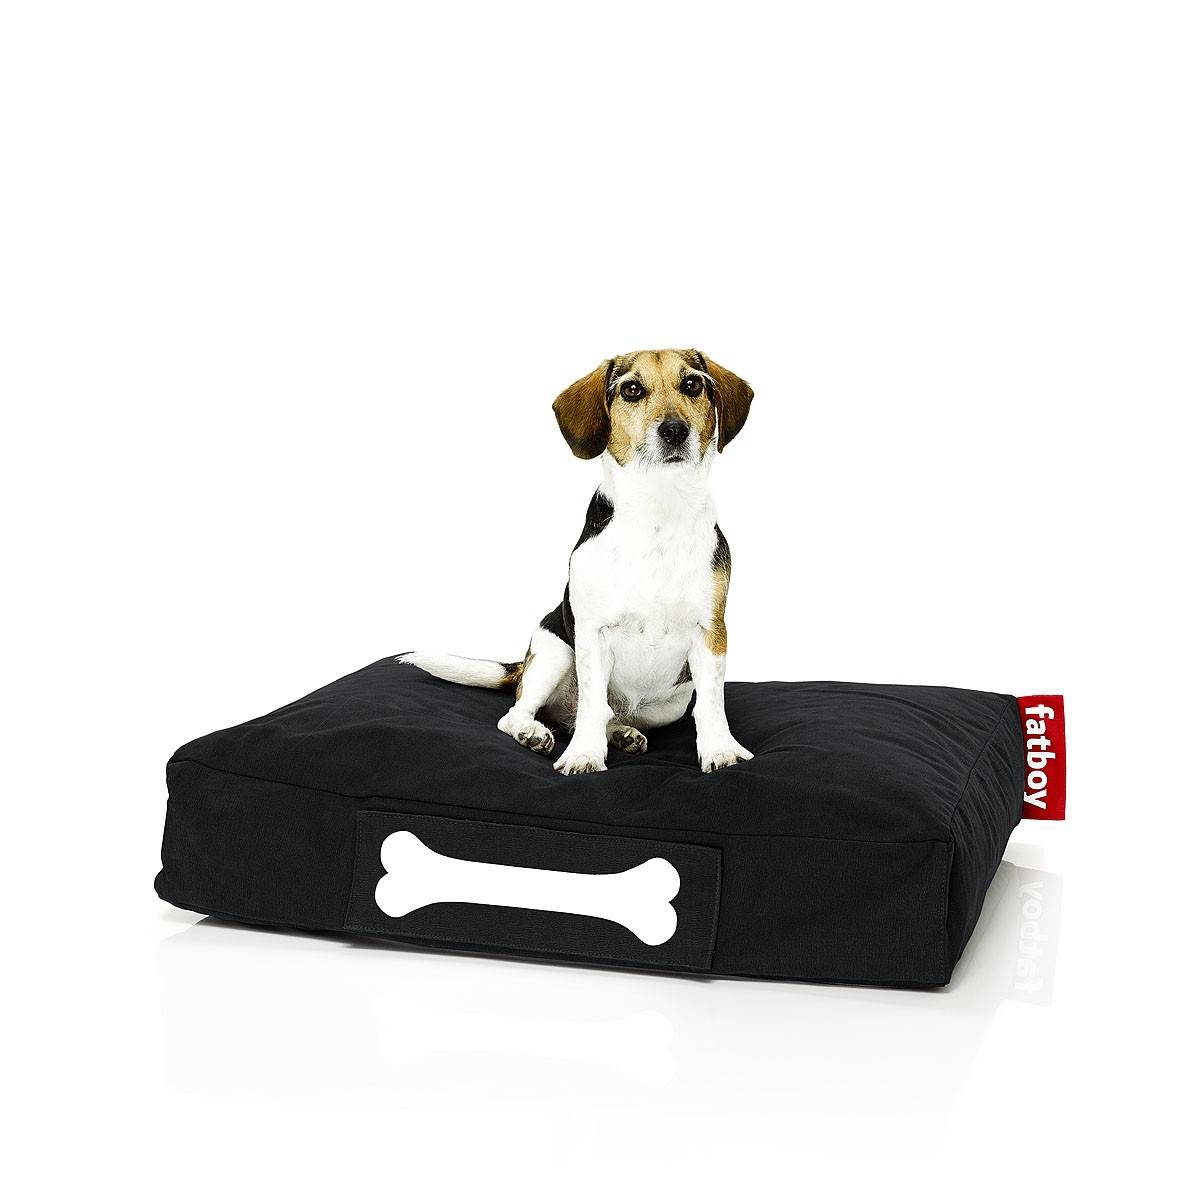 FATBOY sac pouf pour chiens et chats DOGGIELOUNGE STONEWASHED SMALL (Noir - 100% Coton)